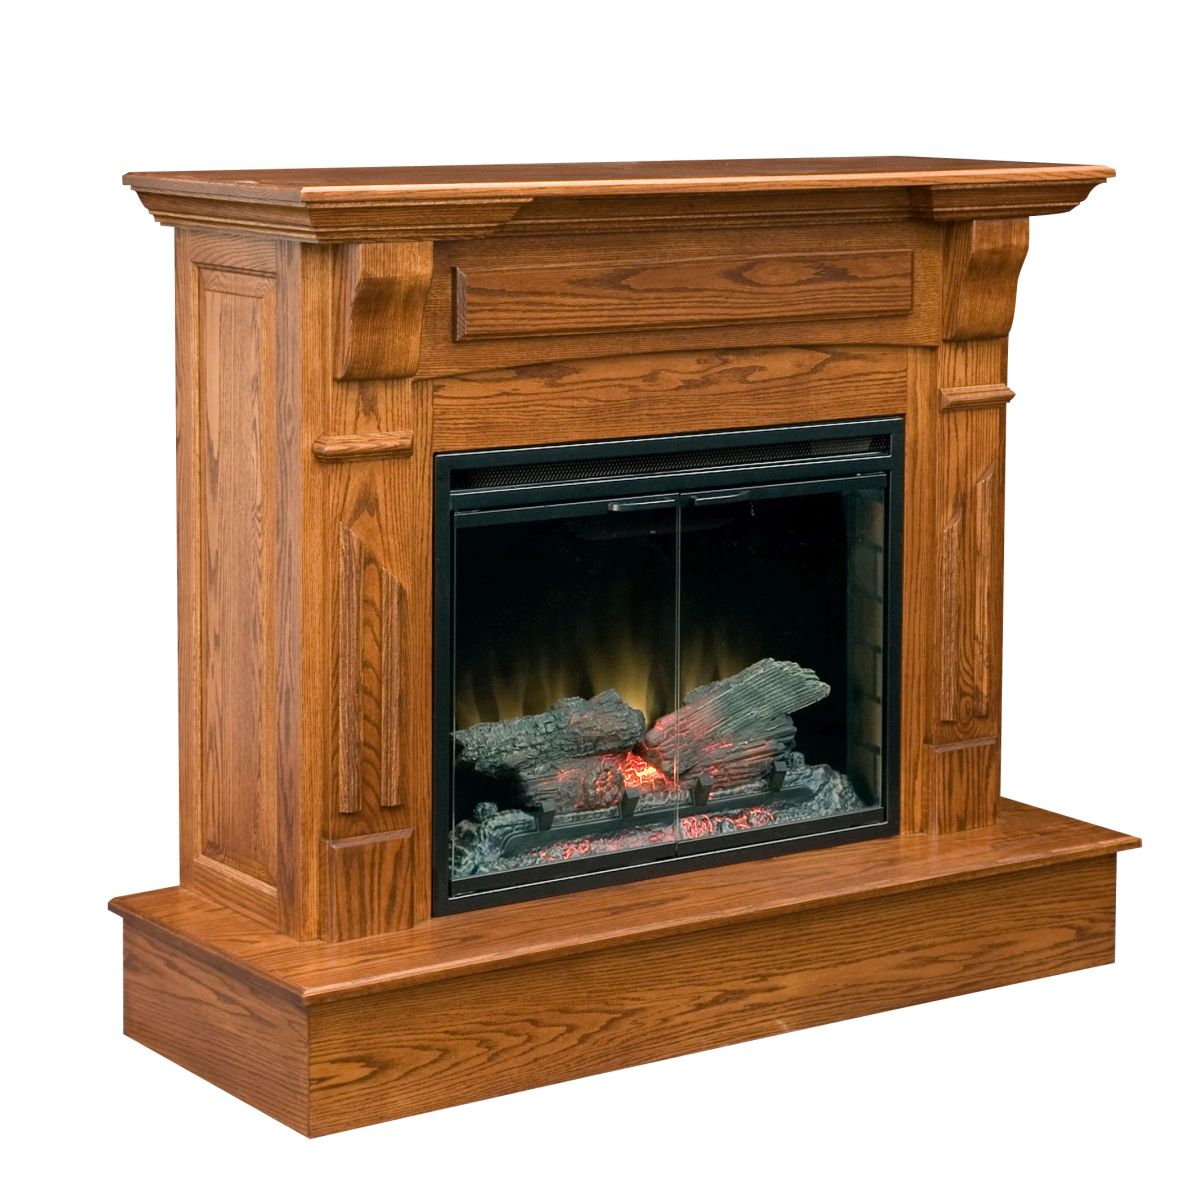 Eastown Fireplace